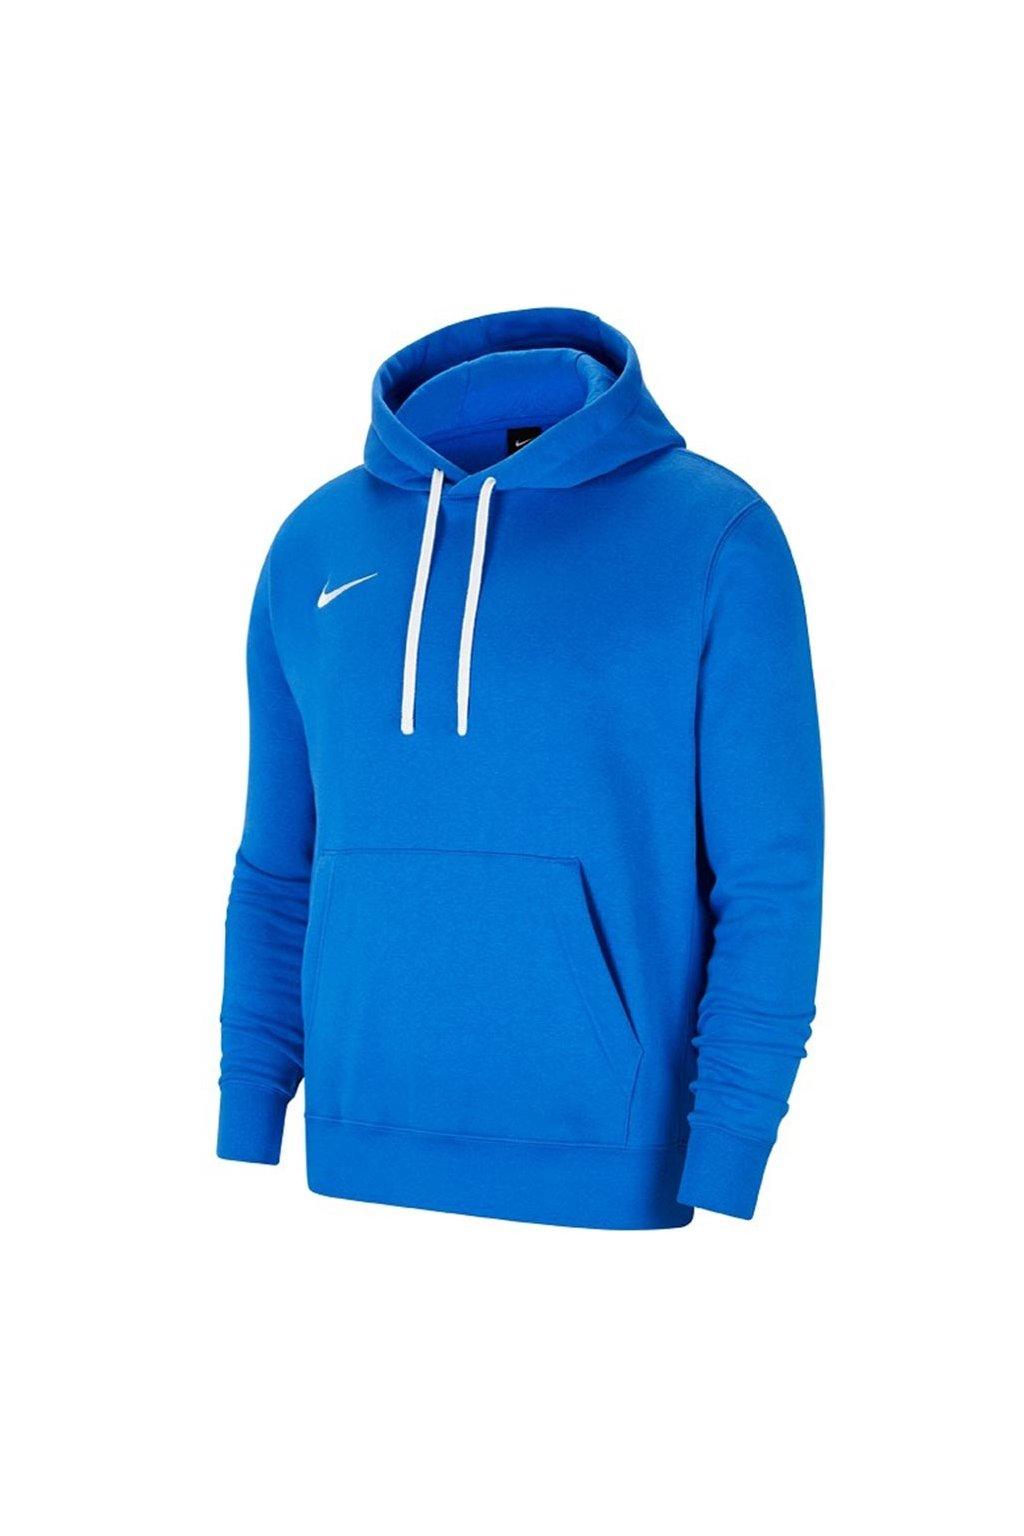 Dámska mikina Nike Team Club 20 Hoodie modrá CW6957 463